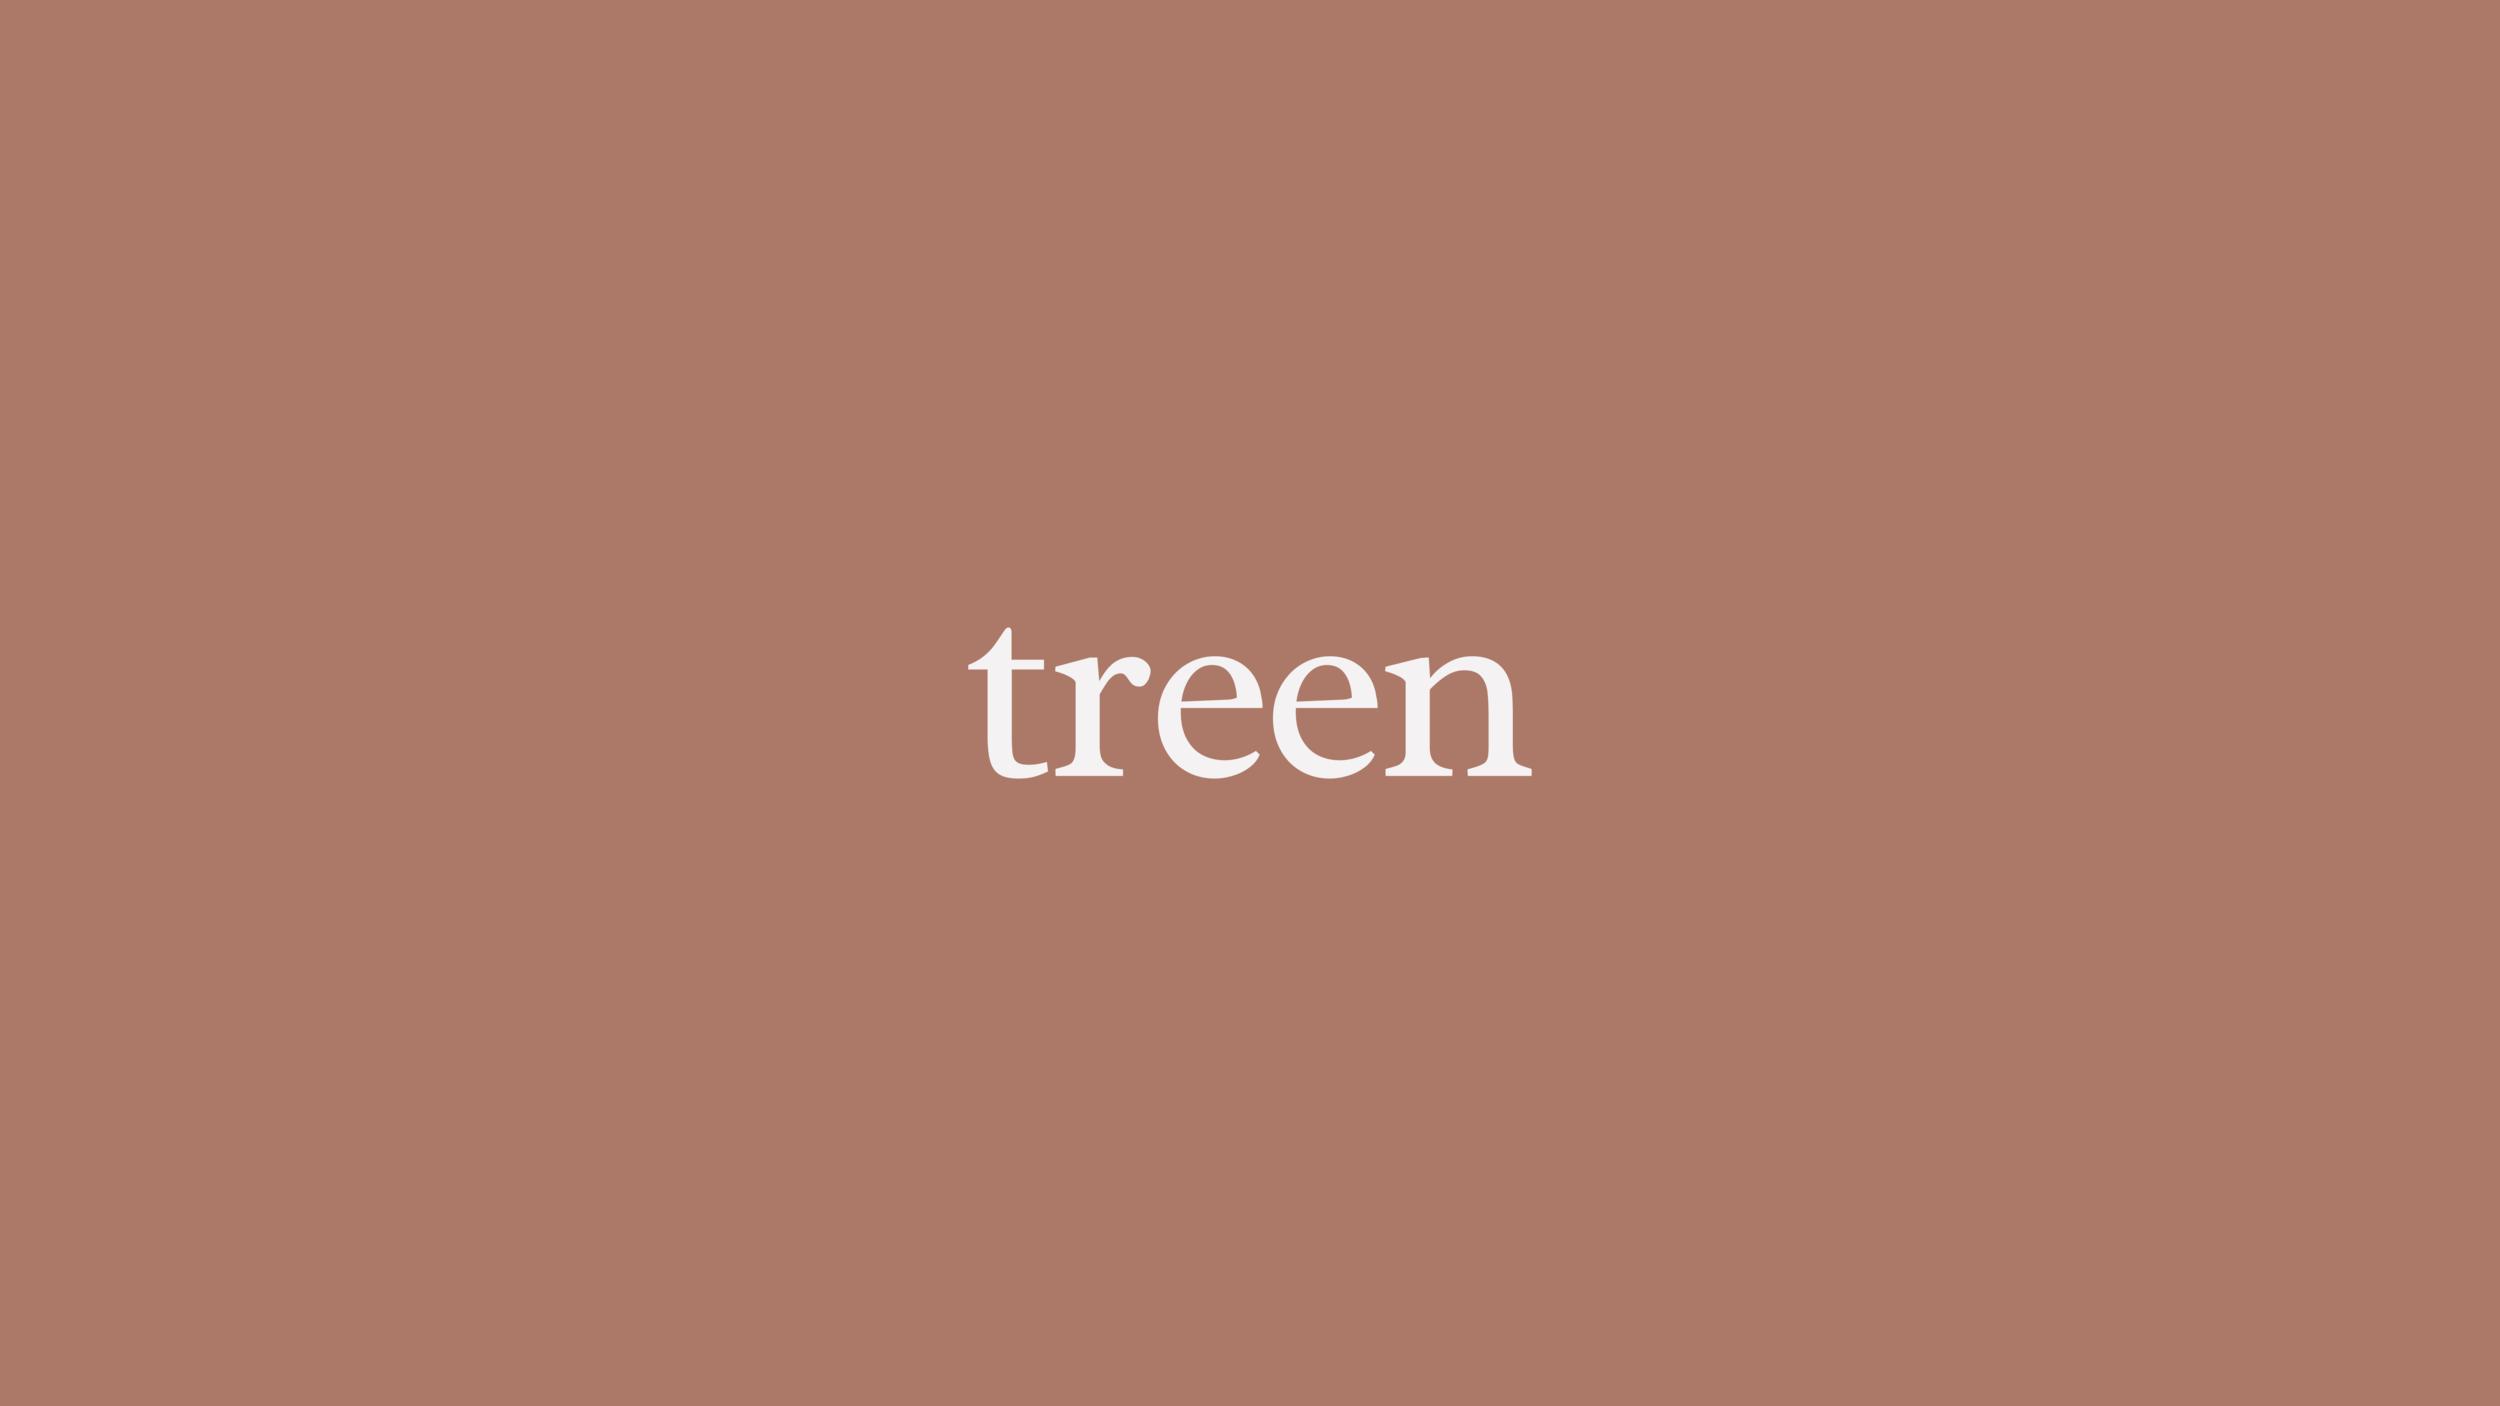 treen-logo-01-01.png